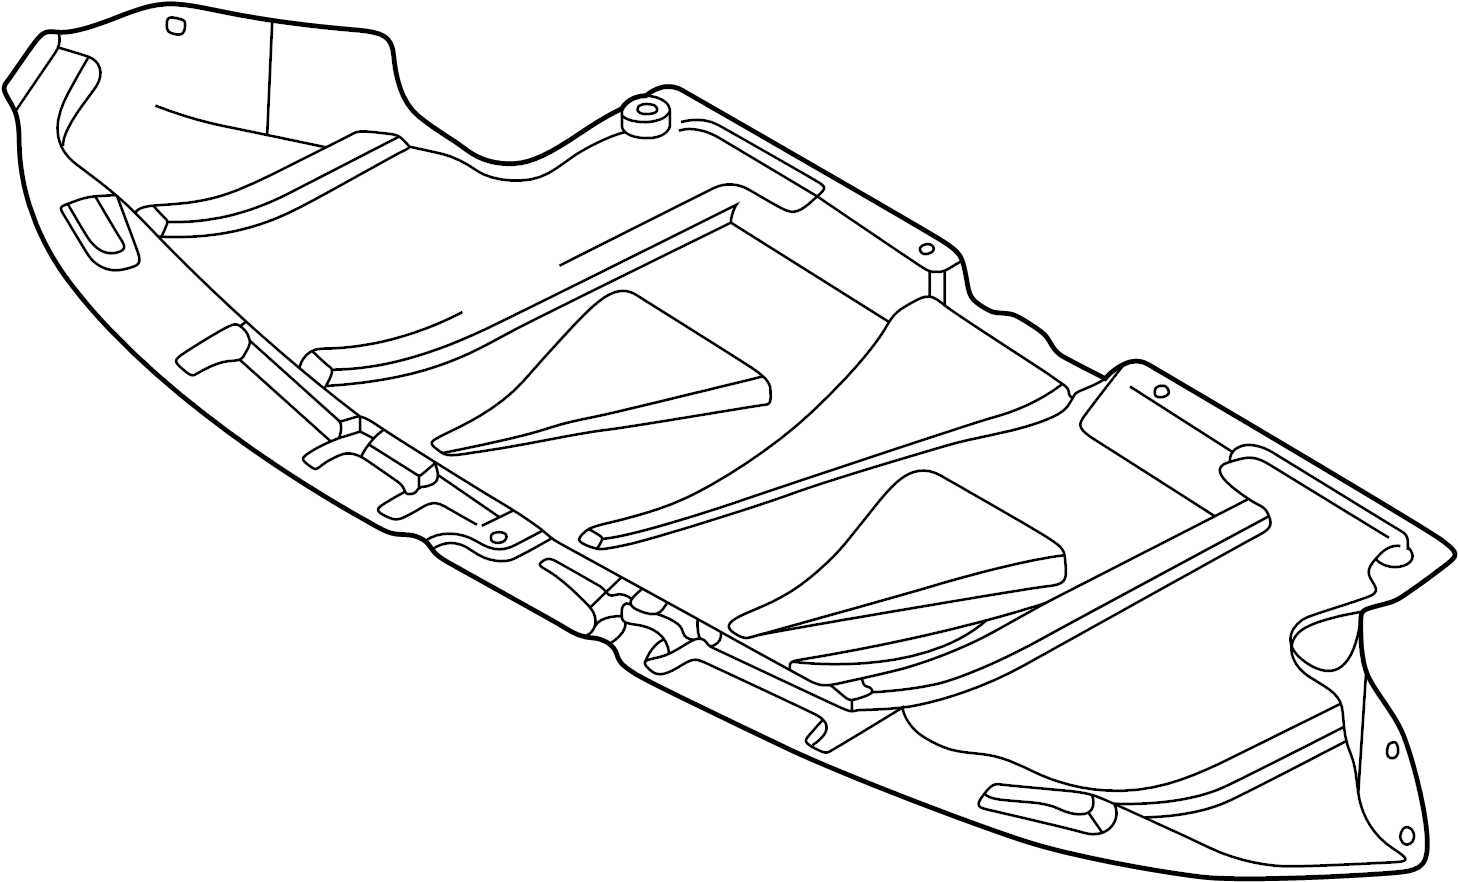 Transaxle parts scat besides splash shields scat additionally vw engine parts diagram likewise vw eos gas